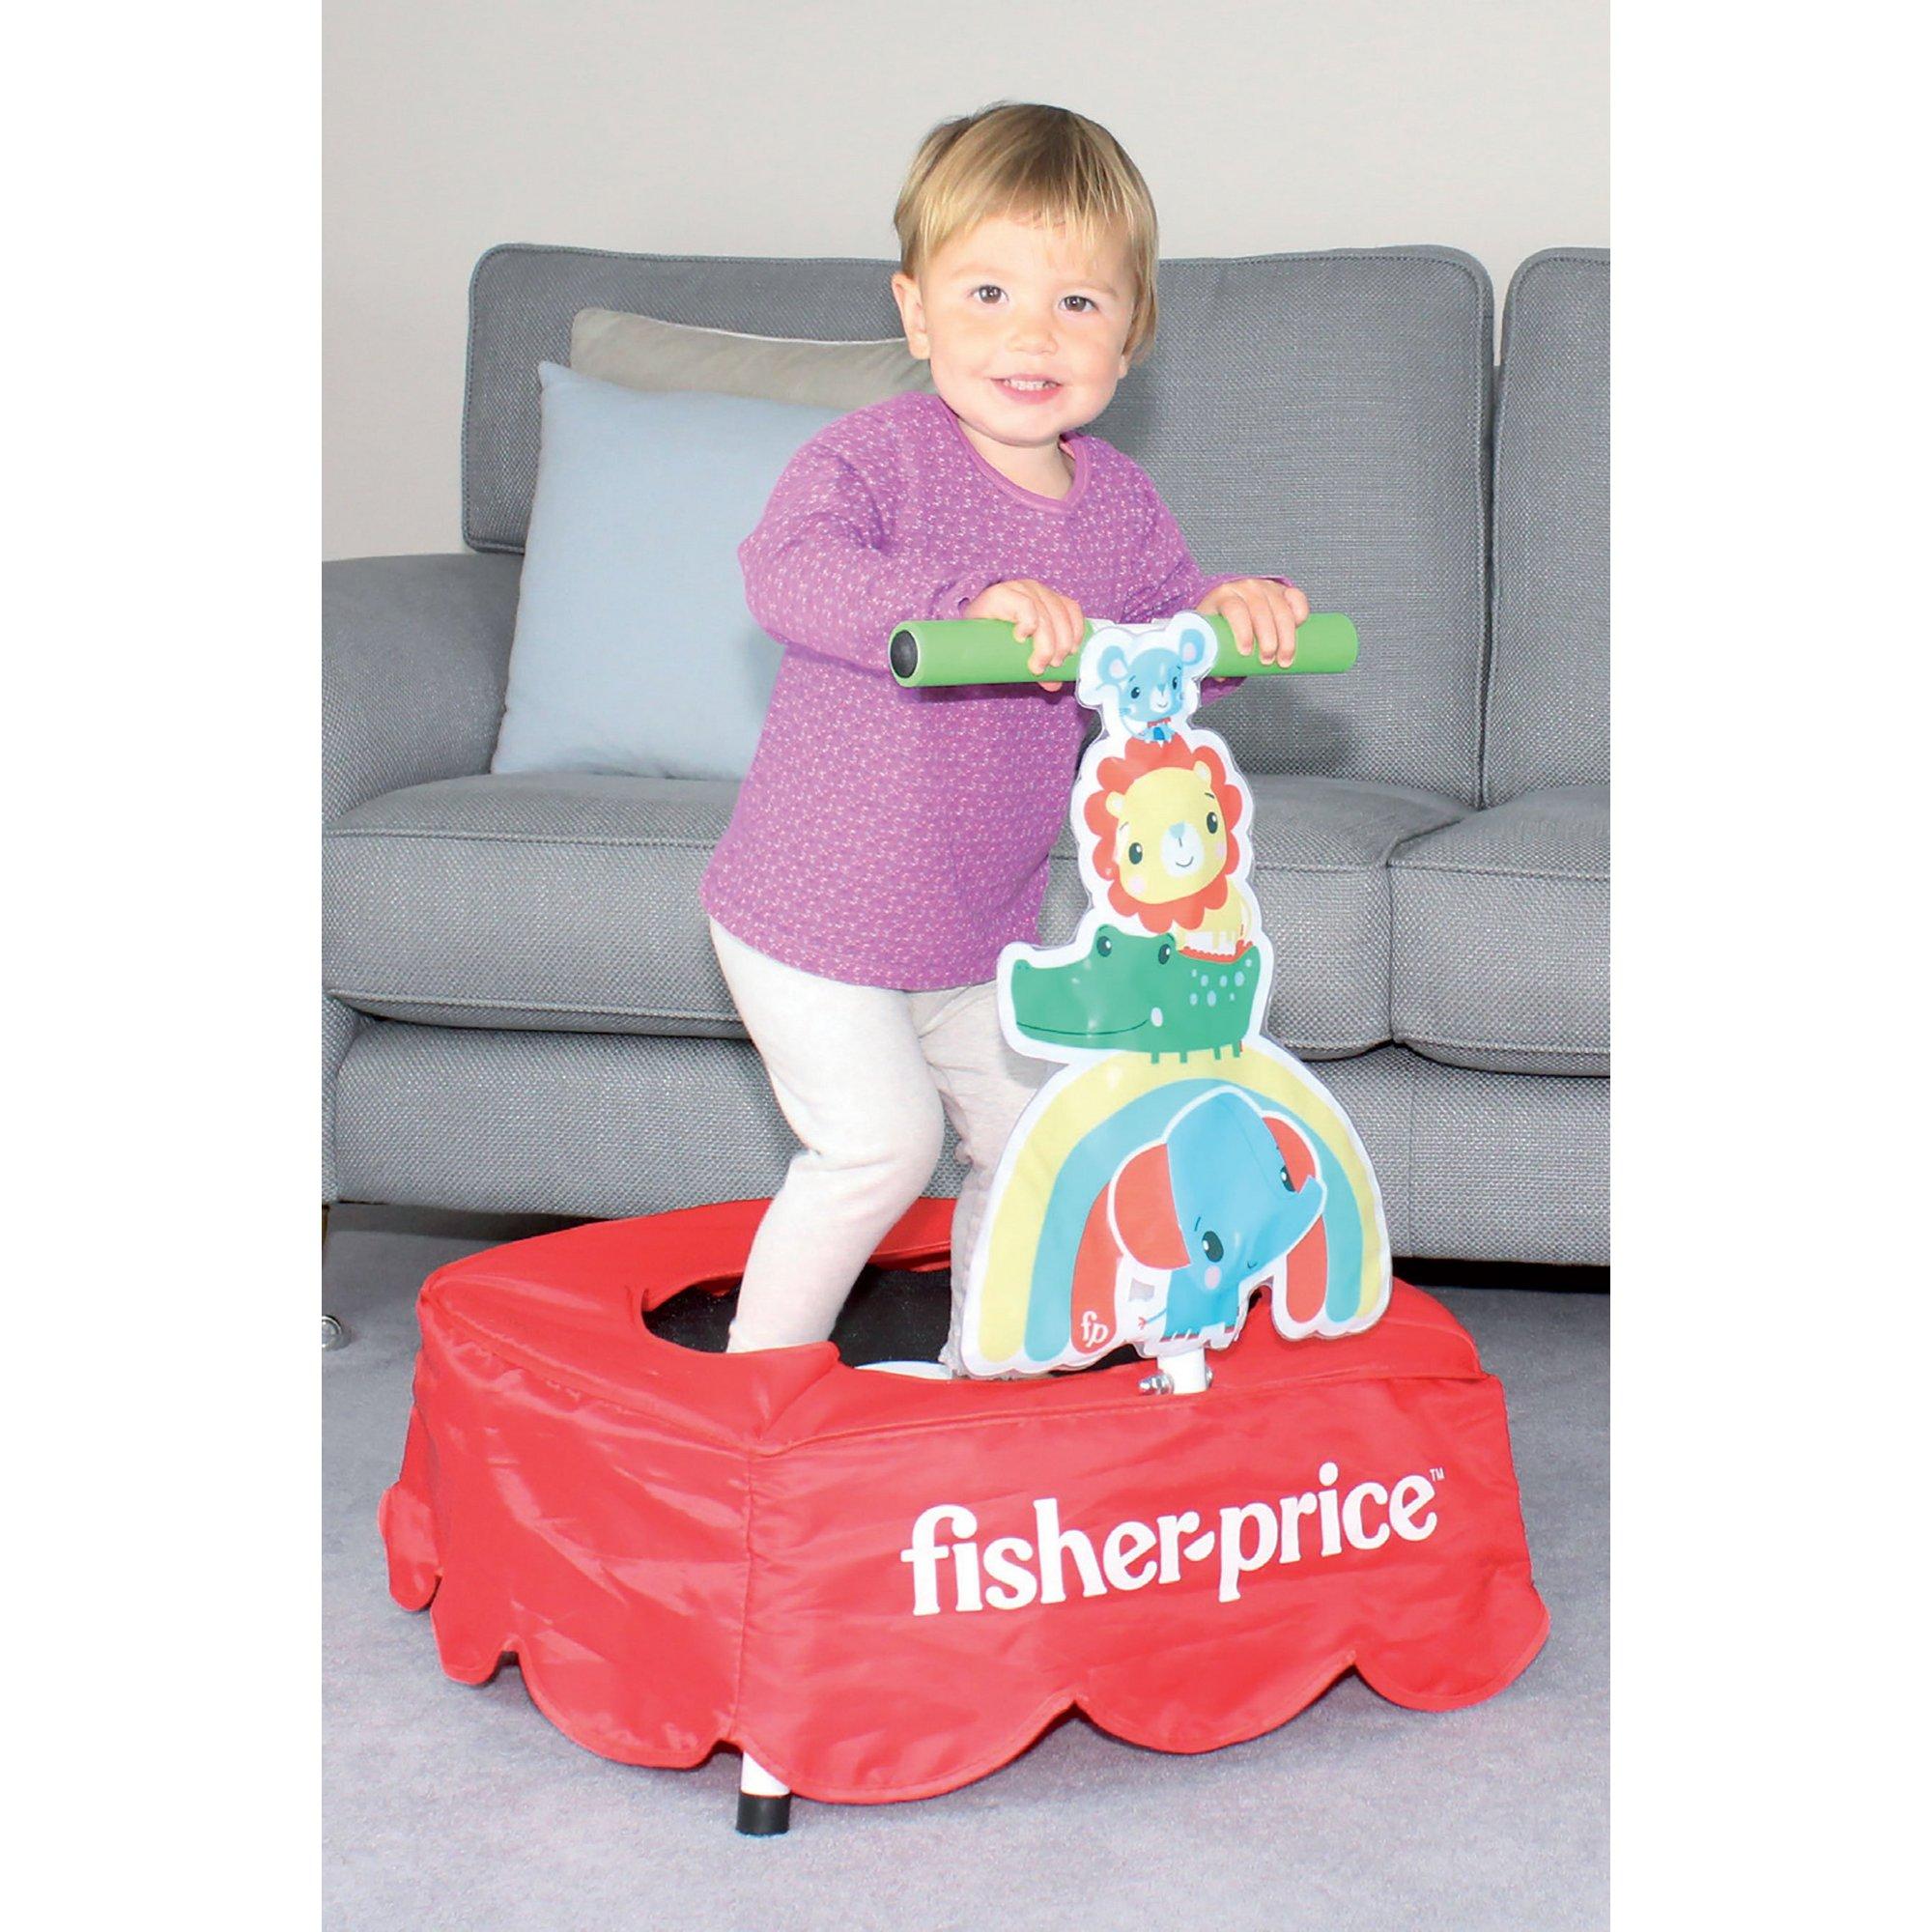 Image of Fisher-Price Toddler Trampoline